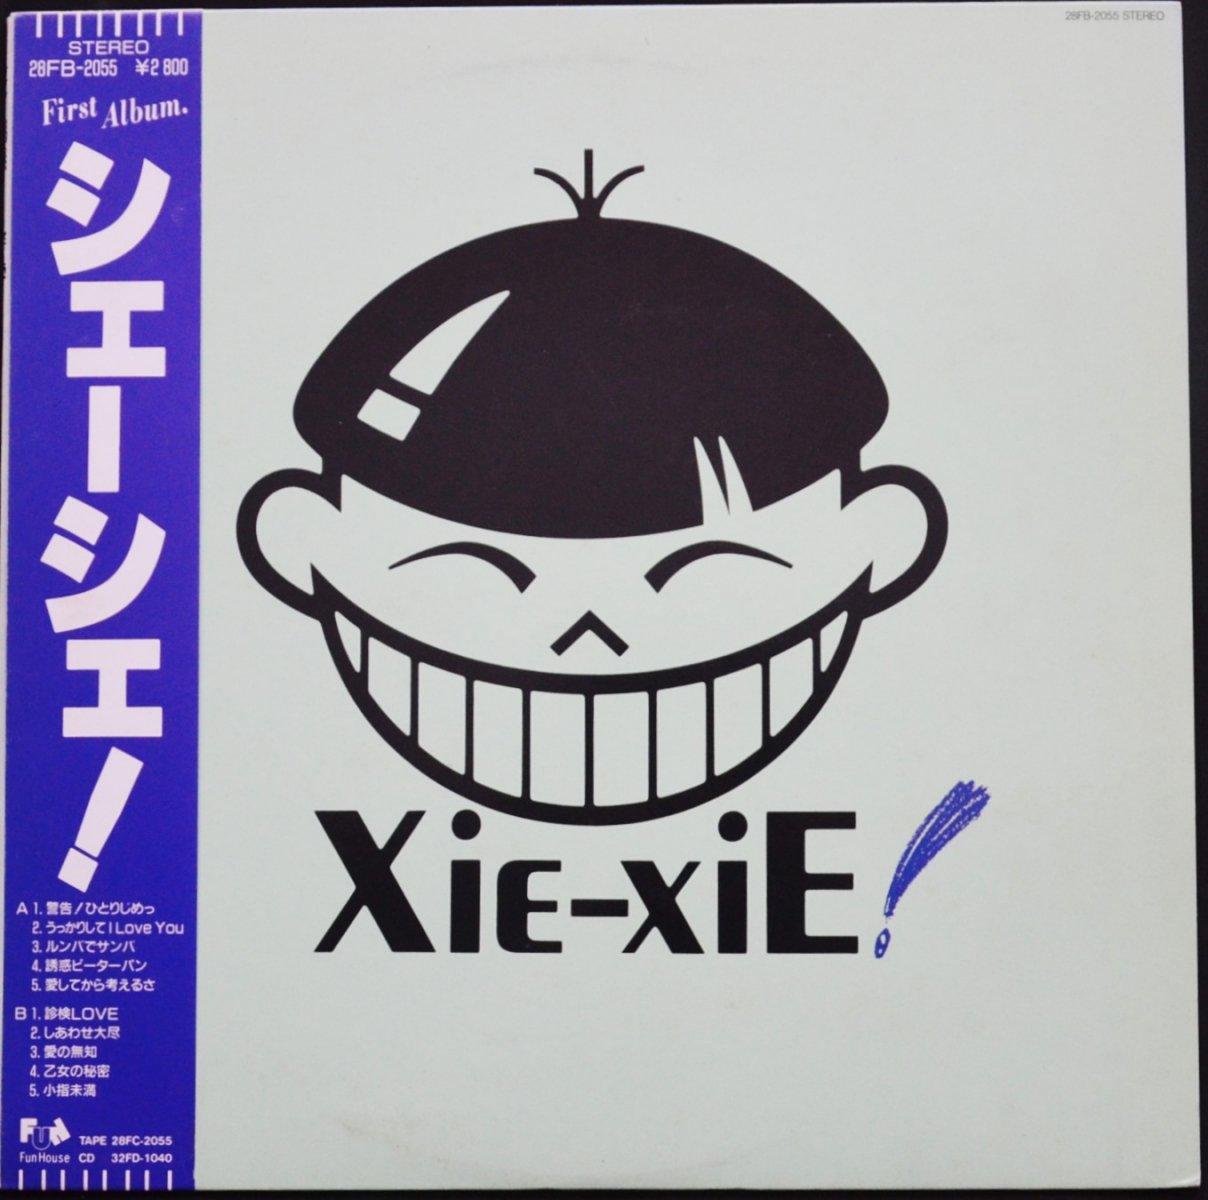 シェーシェ!XIE-XIE / XIE-XIE! (LP)